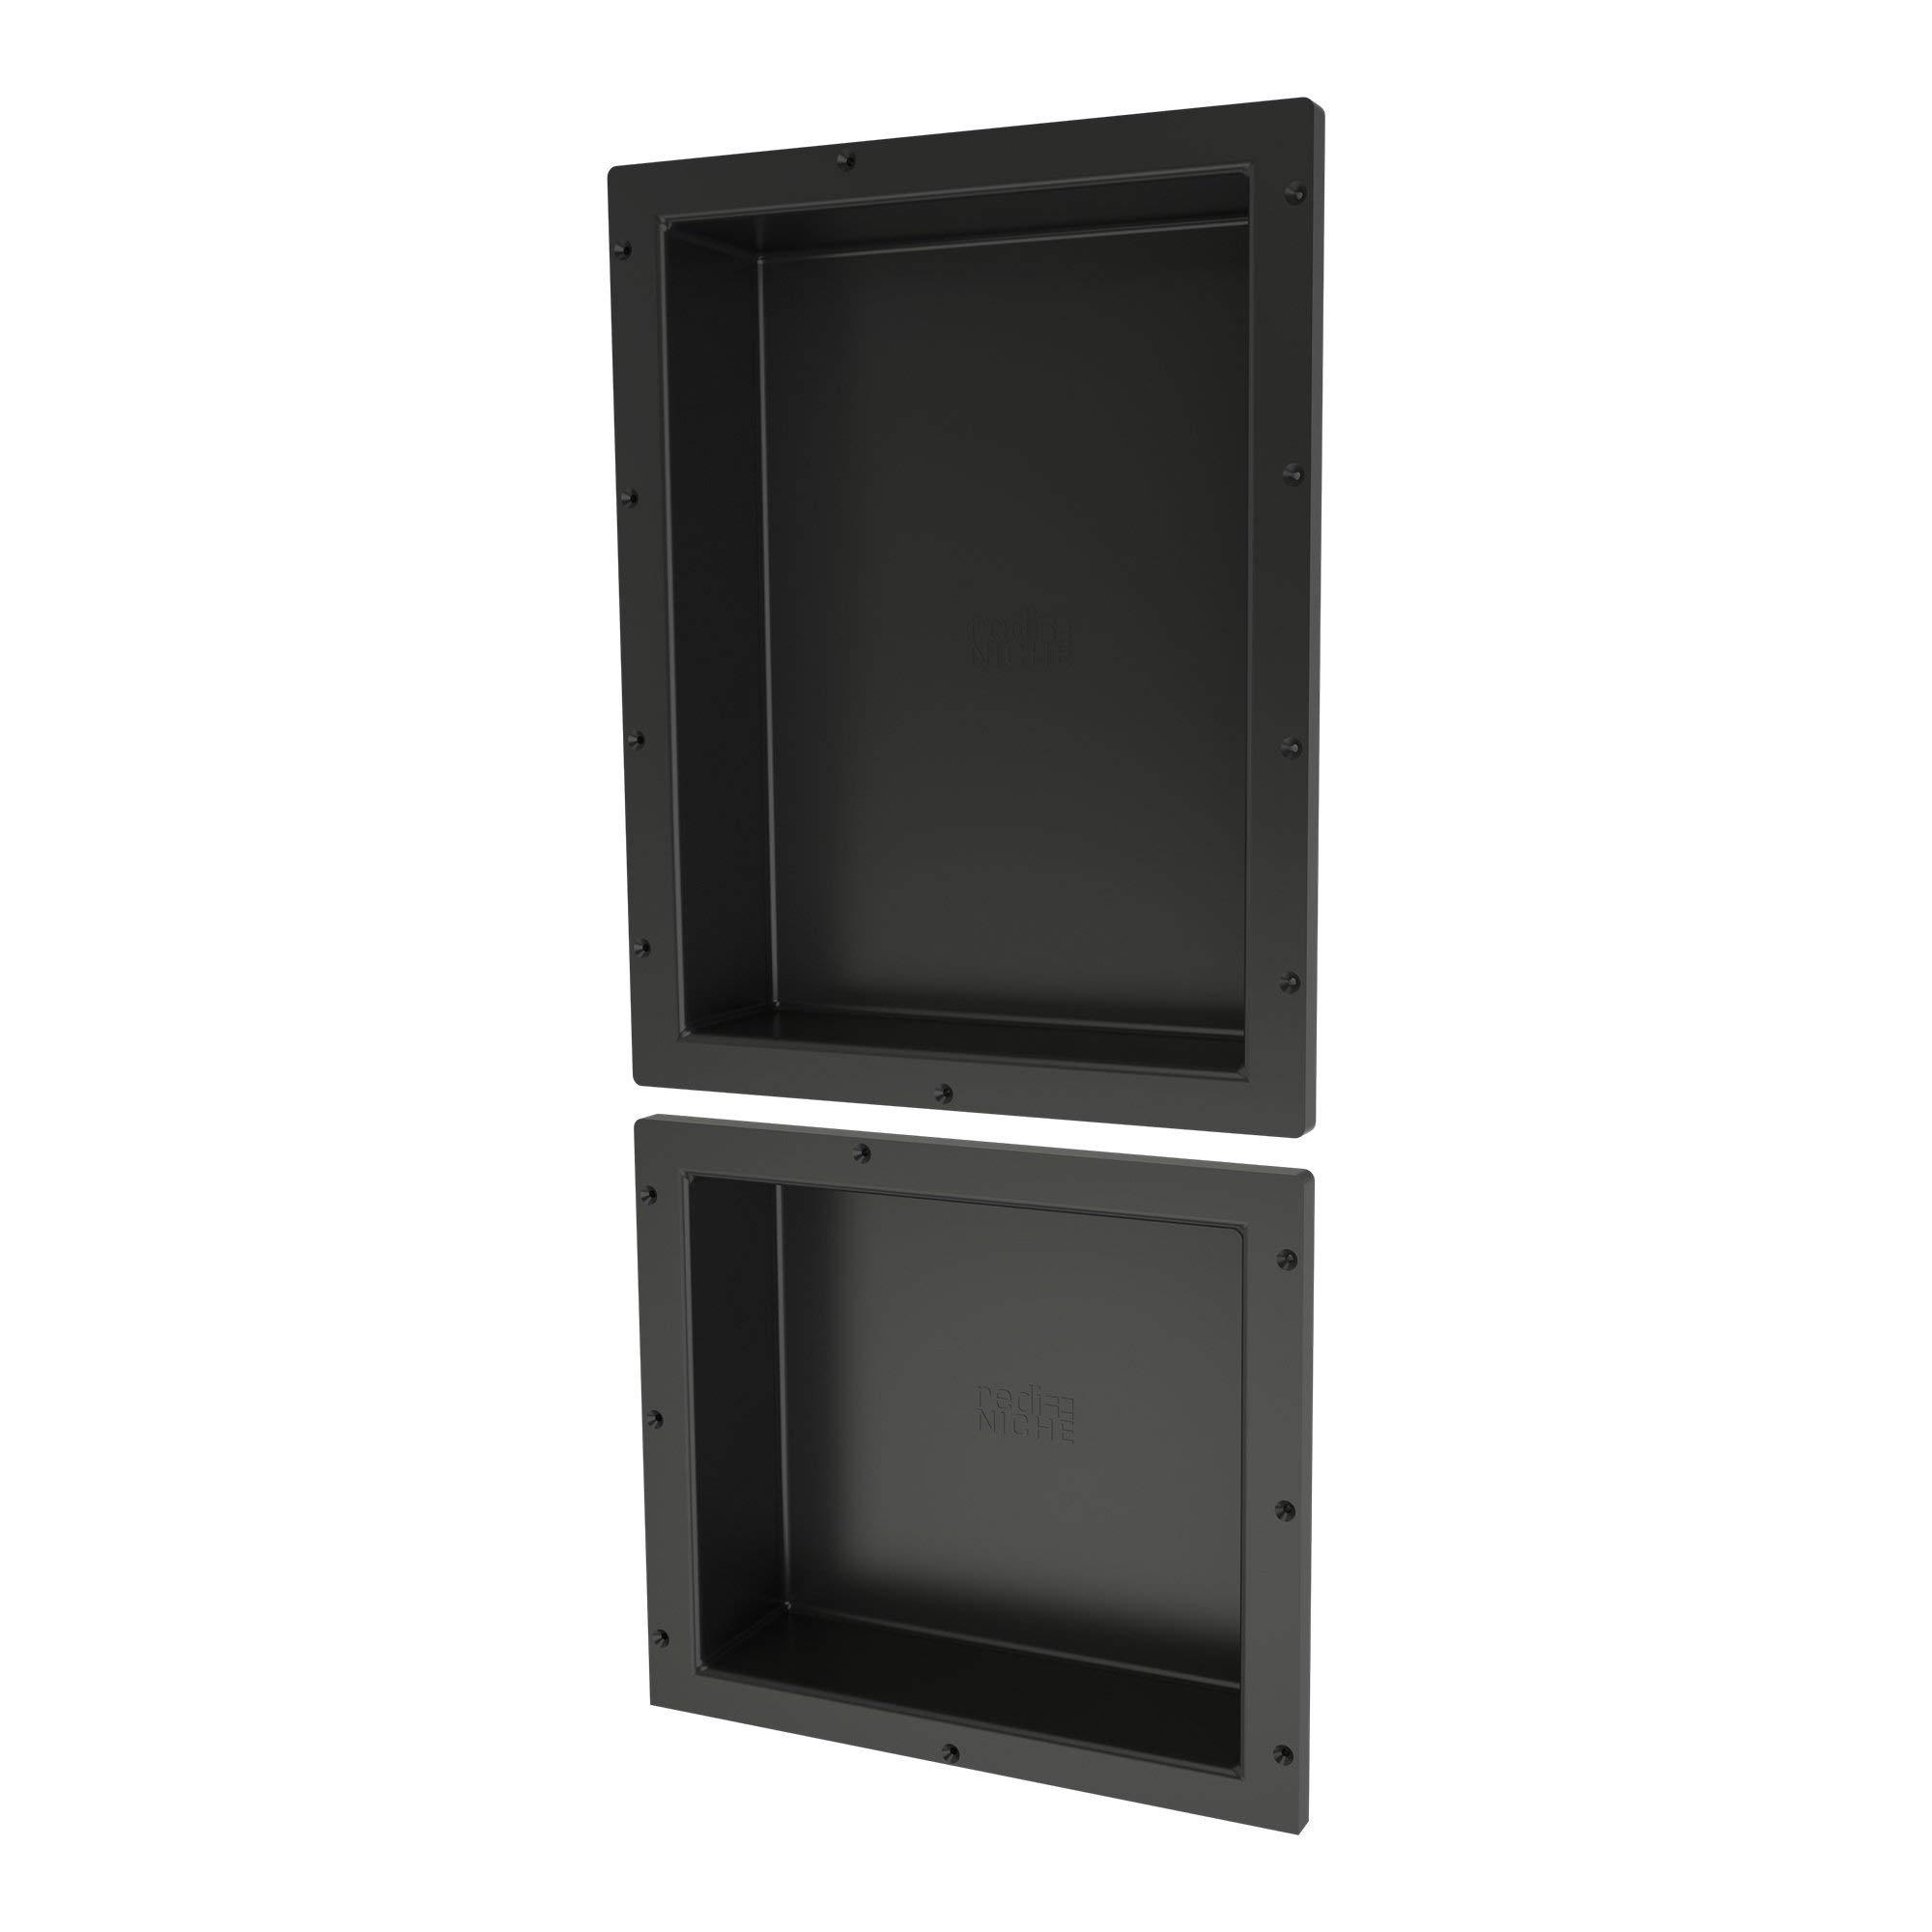 Tile Redi USA RND1620S-14 Shower Niche, 16''W x 34''H, Black